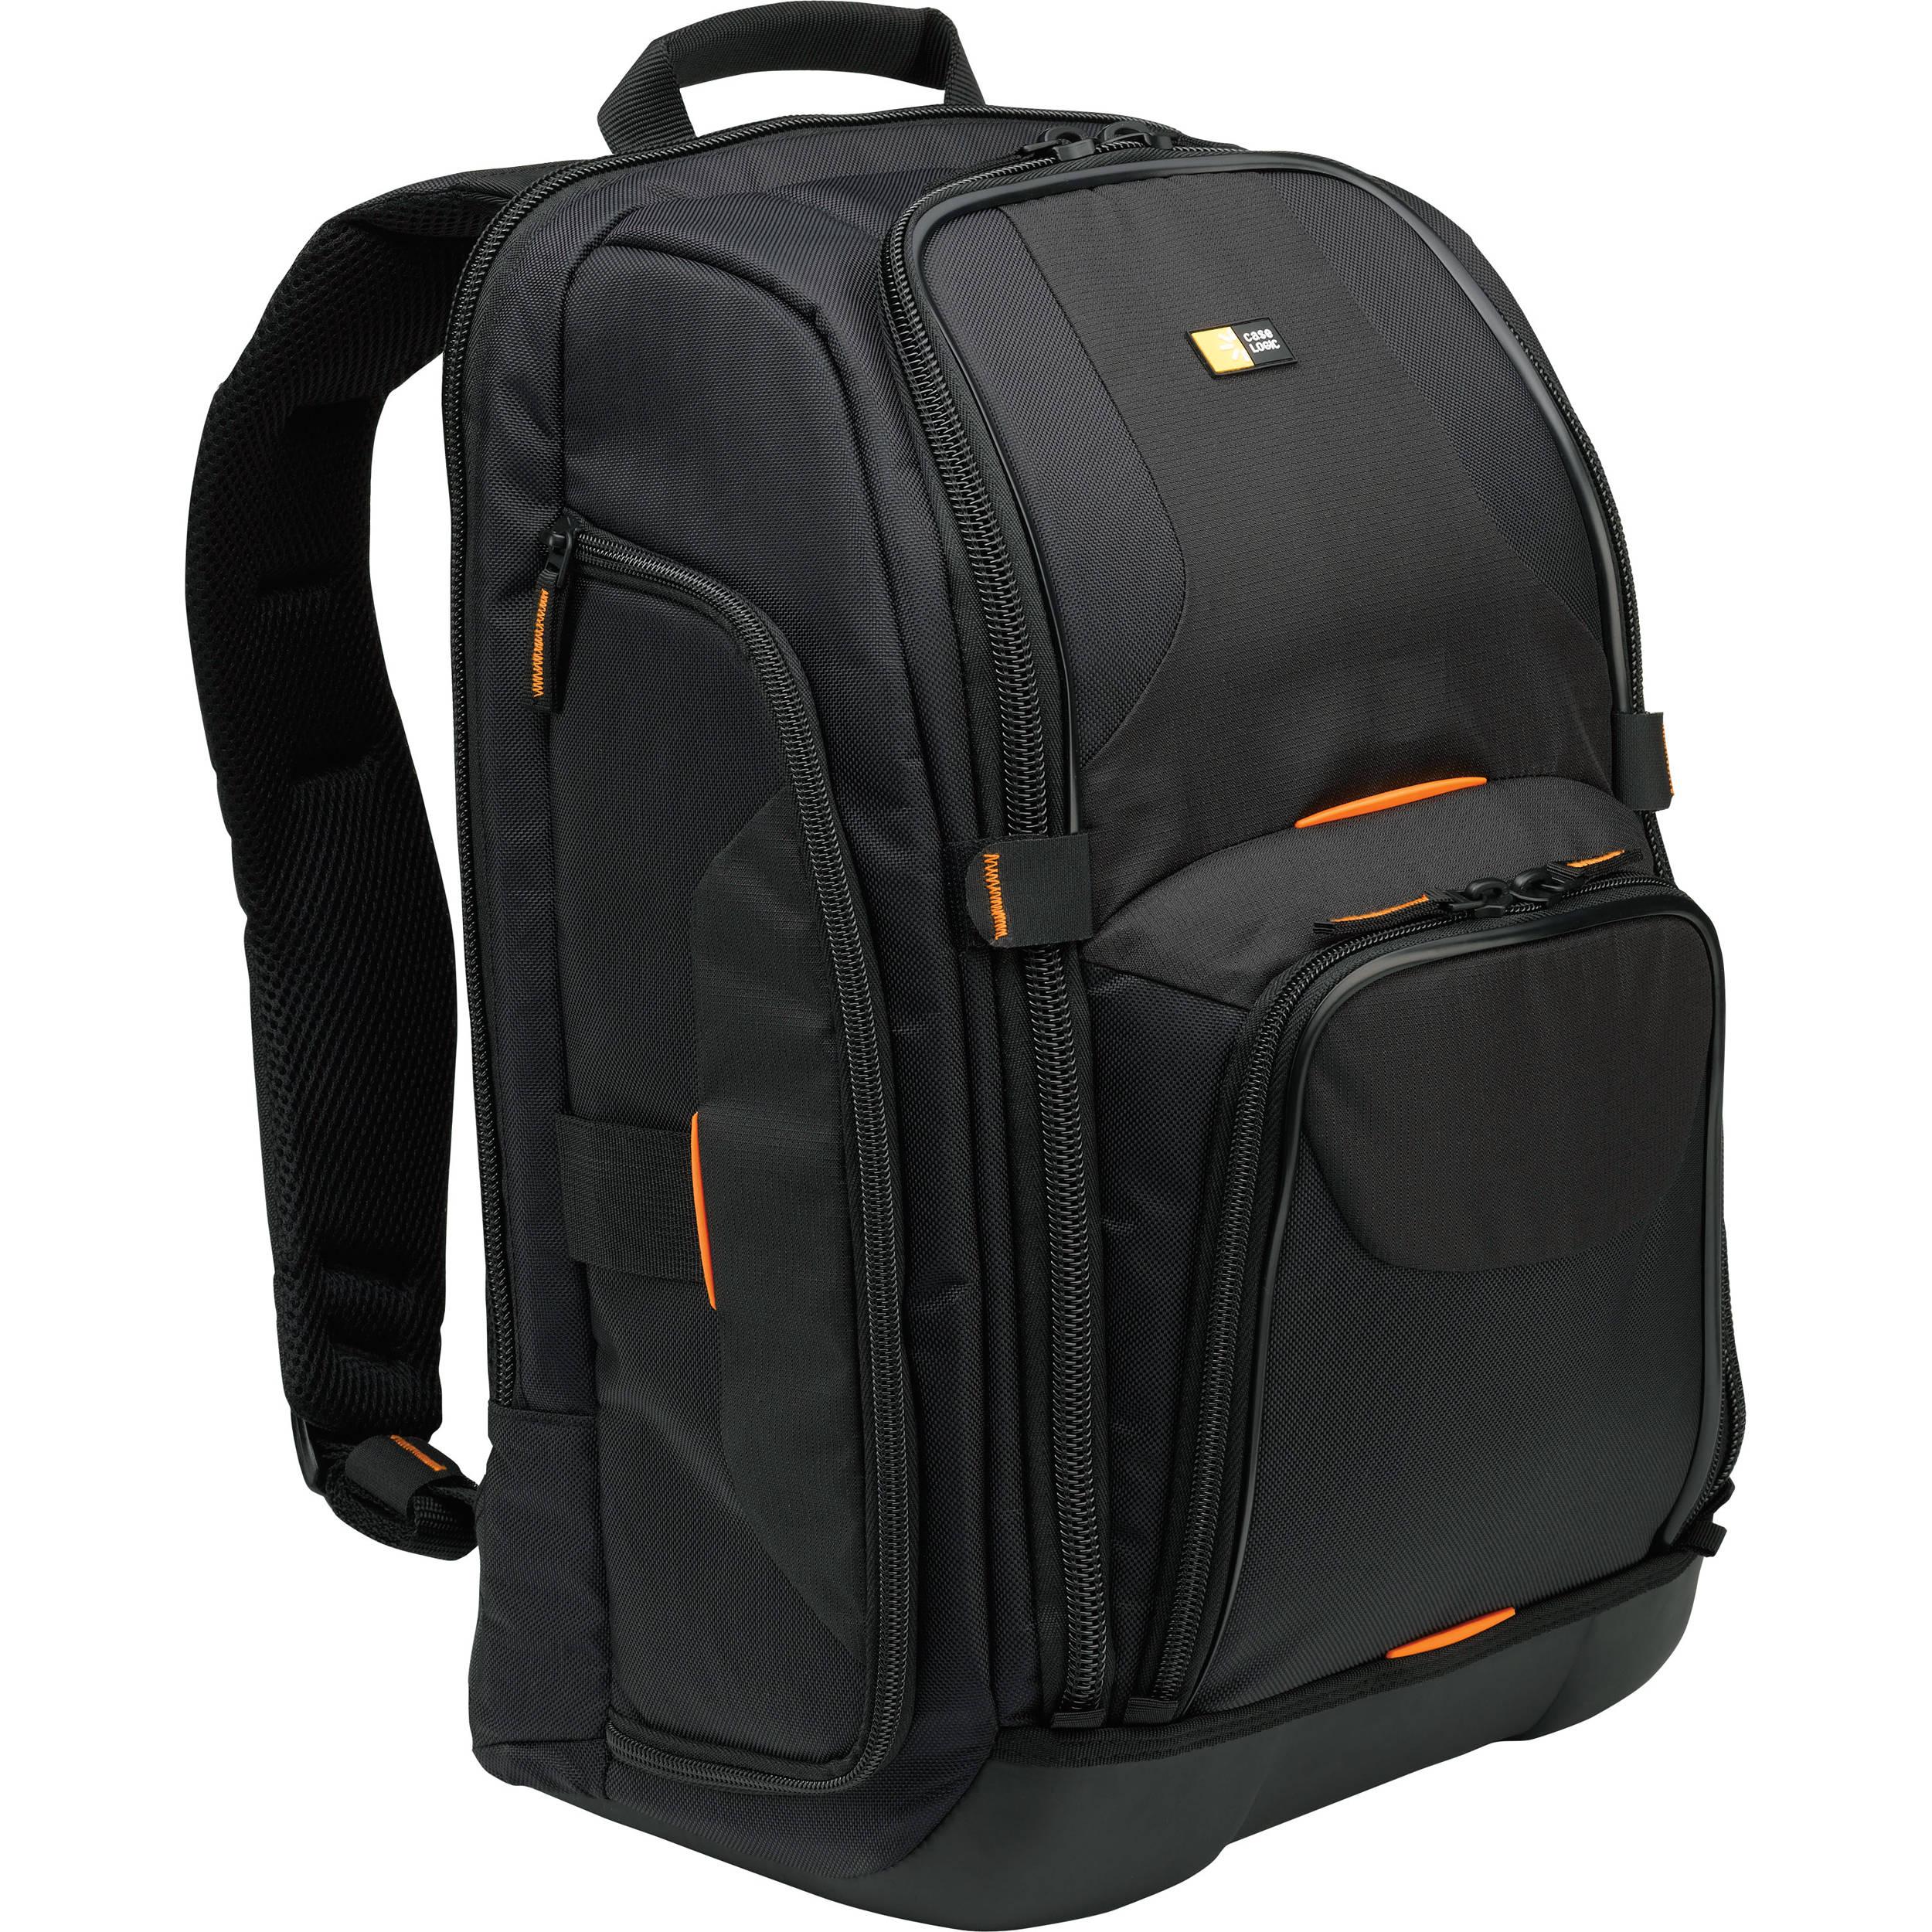 Case Logic Slrc 206 Slr Camera Laptop